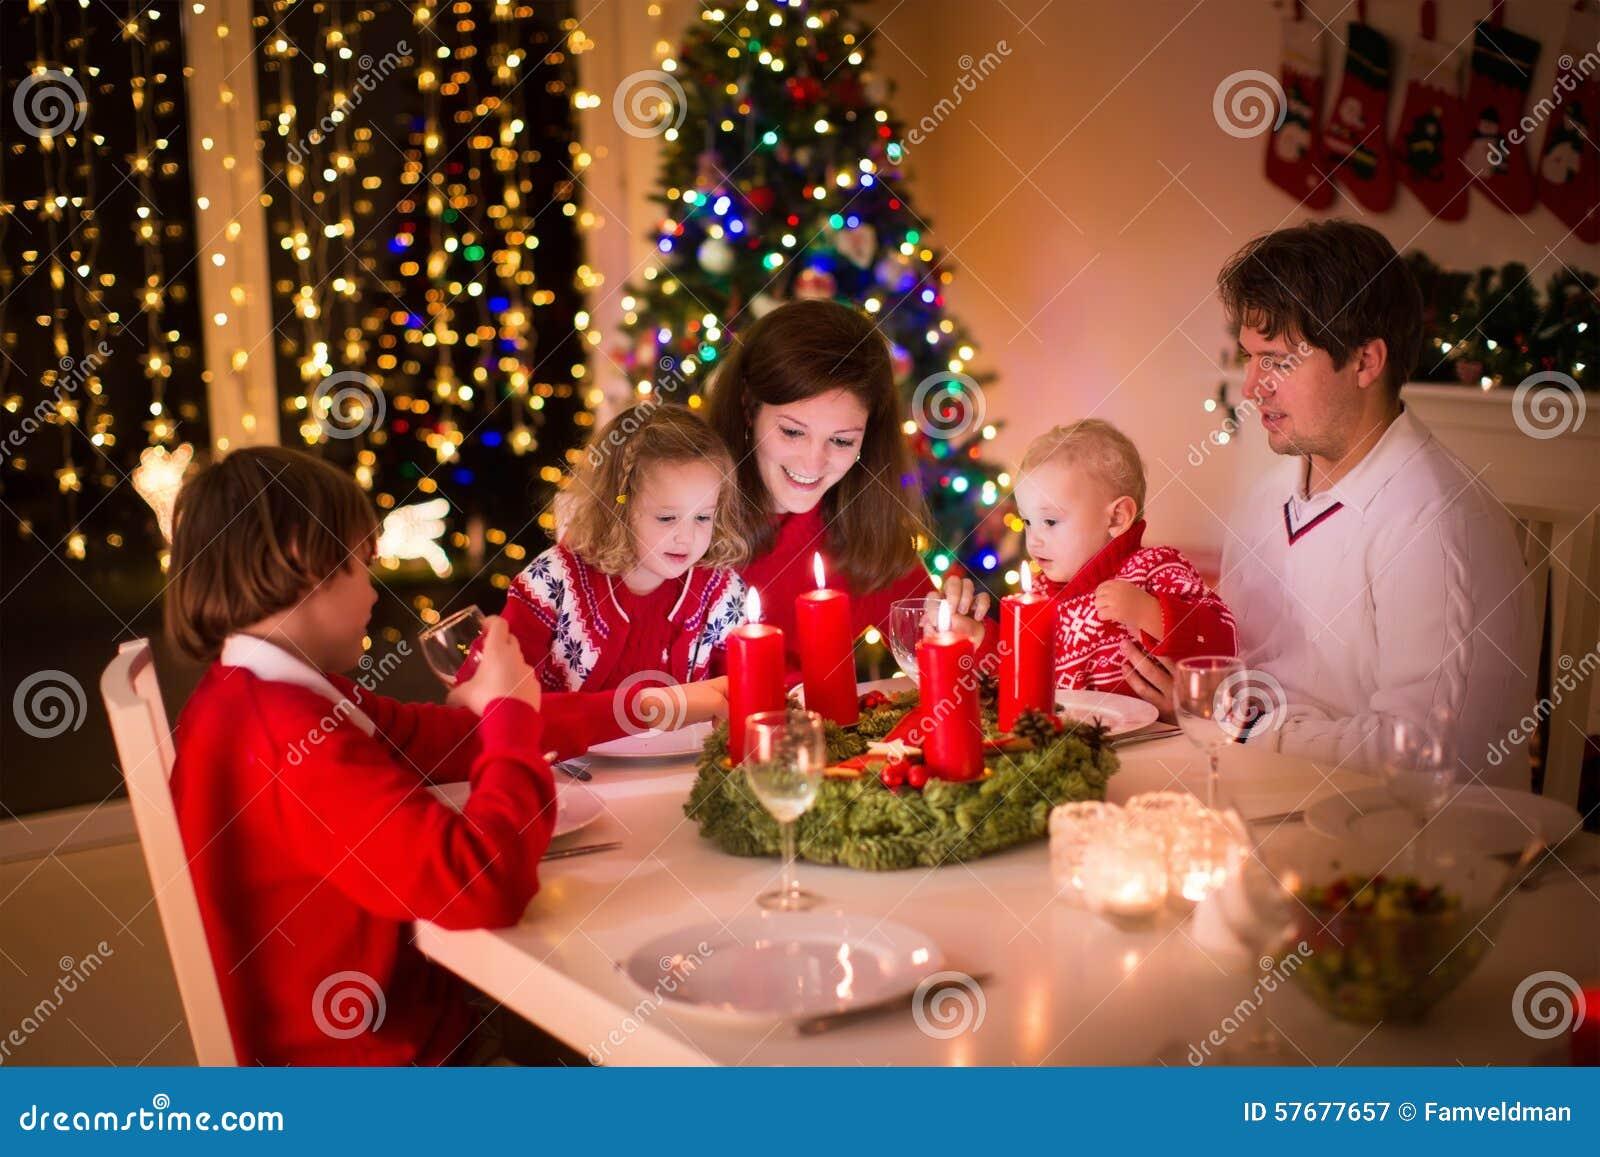 familie mit kindern am weihnachtsessen stockbild bild. Black Bedroom Furniture Sets. Home Design Ideas